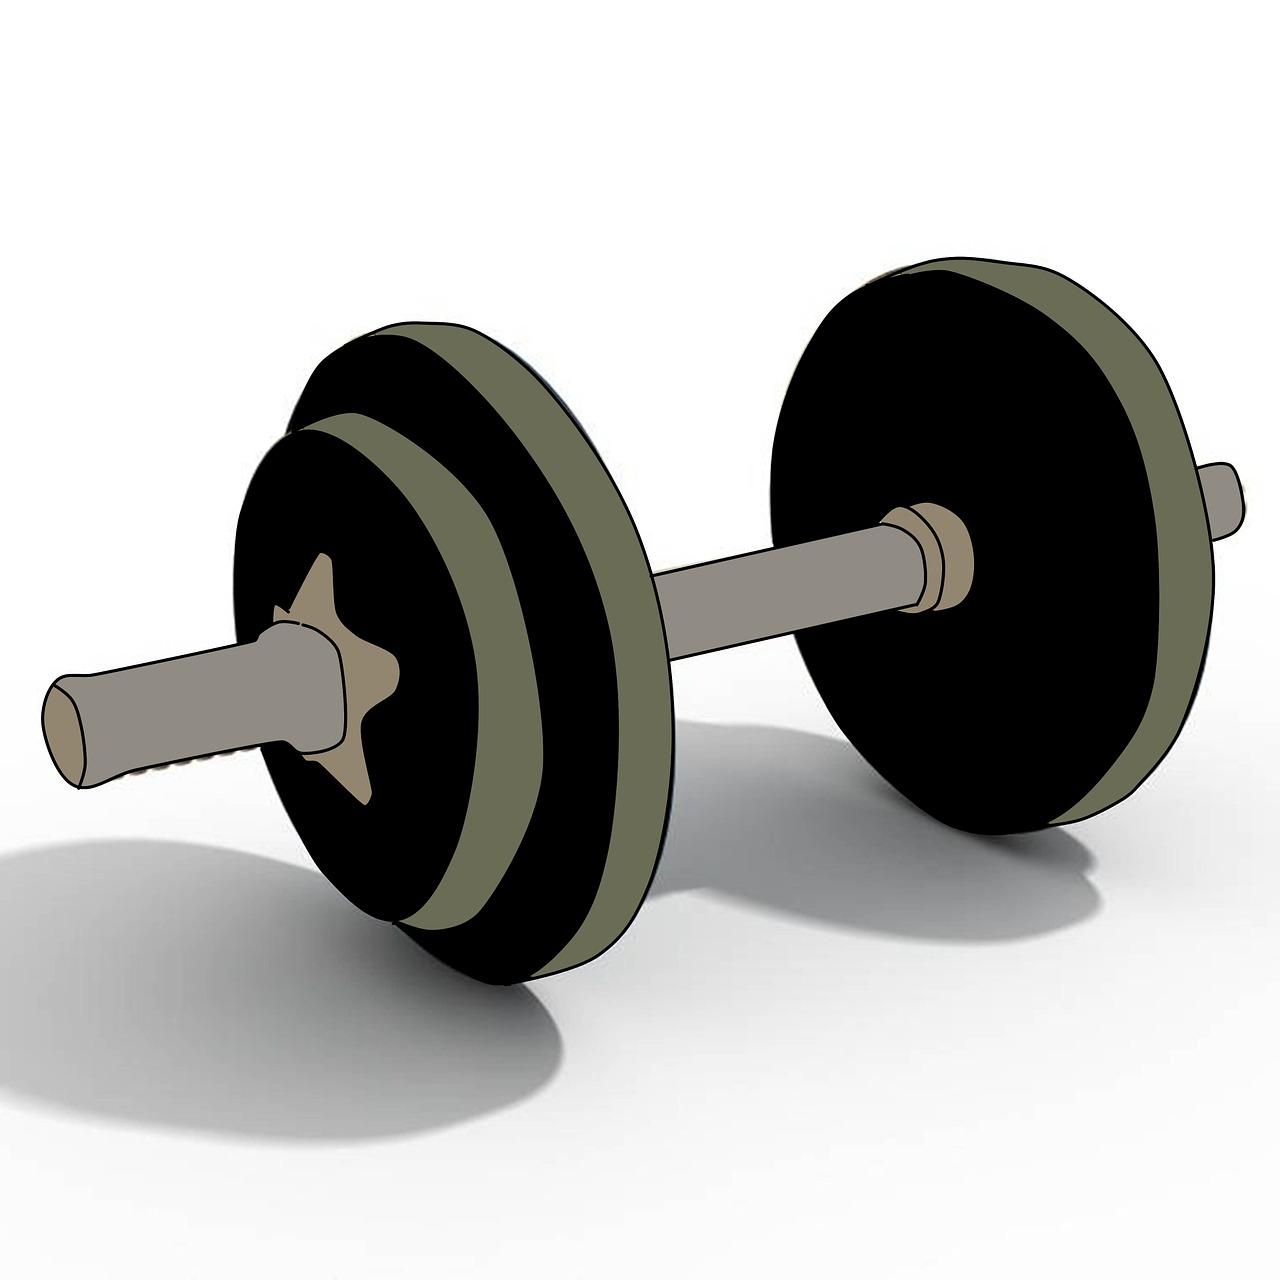 Bodybuilding Weight Academy Dumbbells Illustration Free Photo